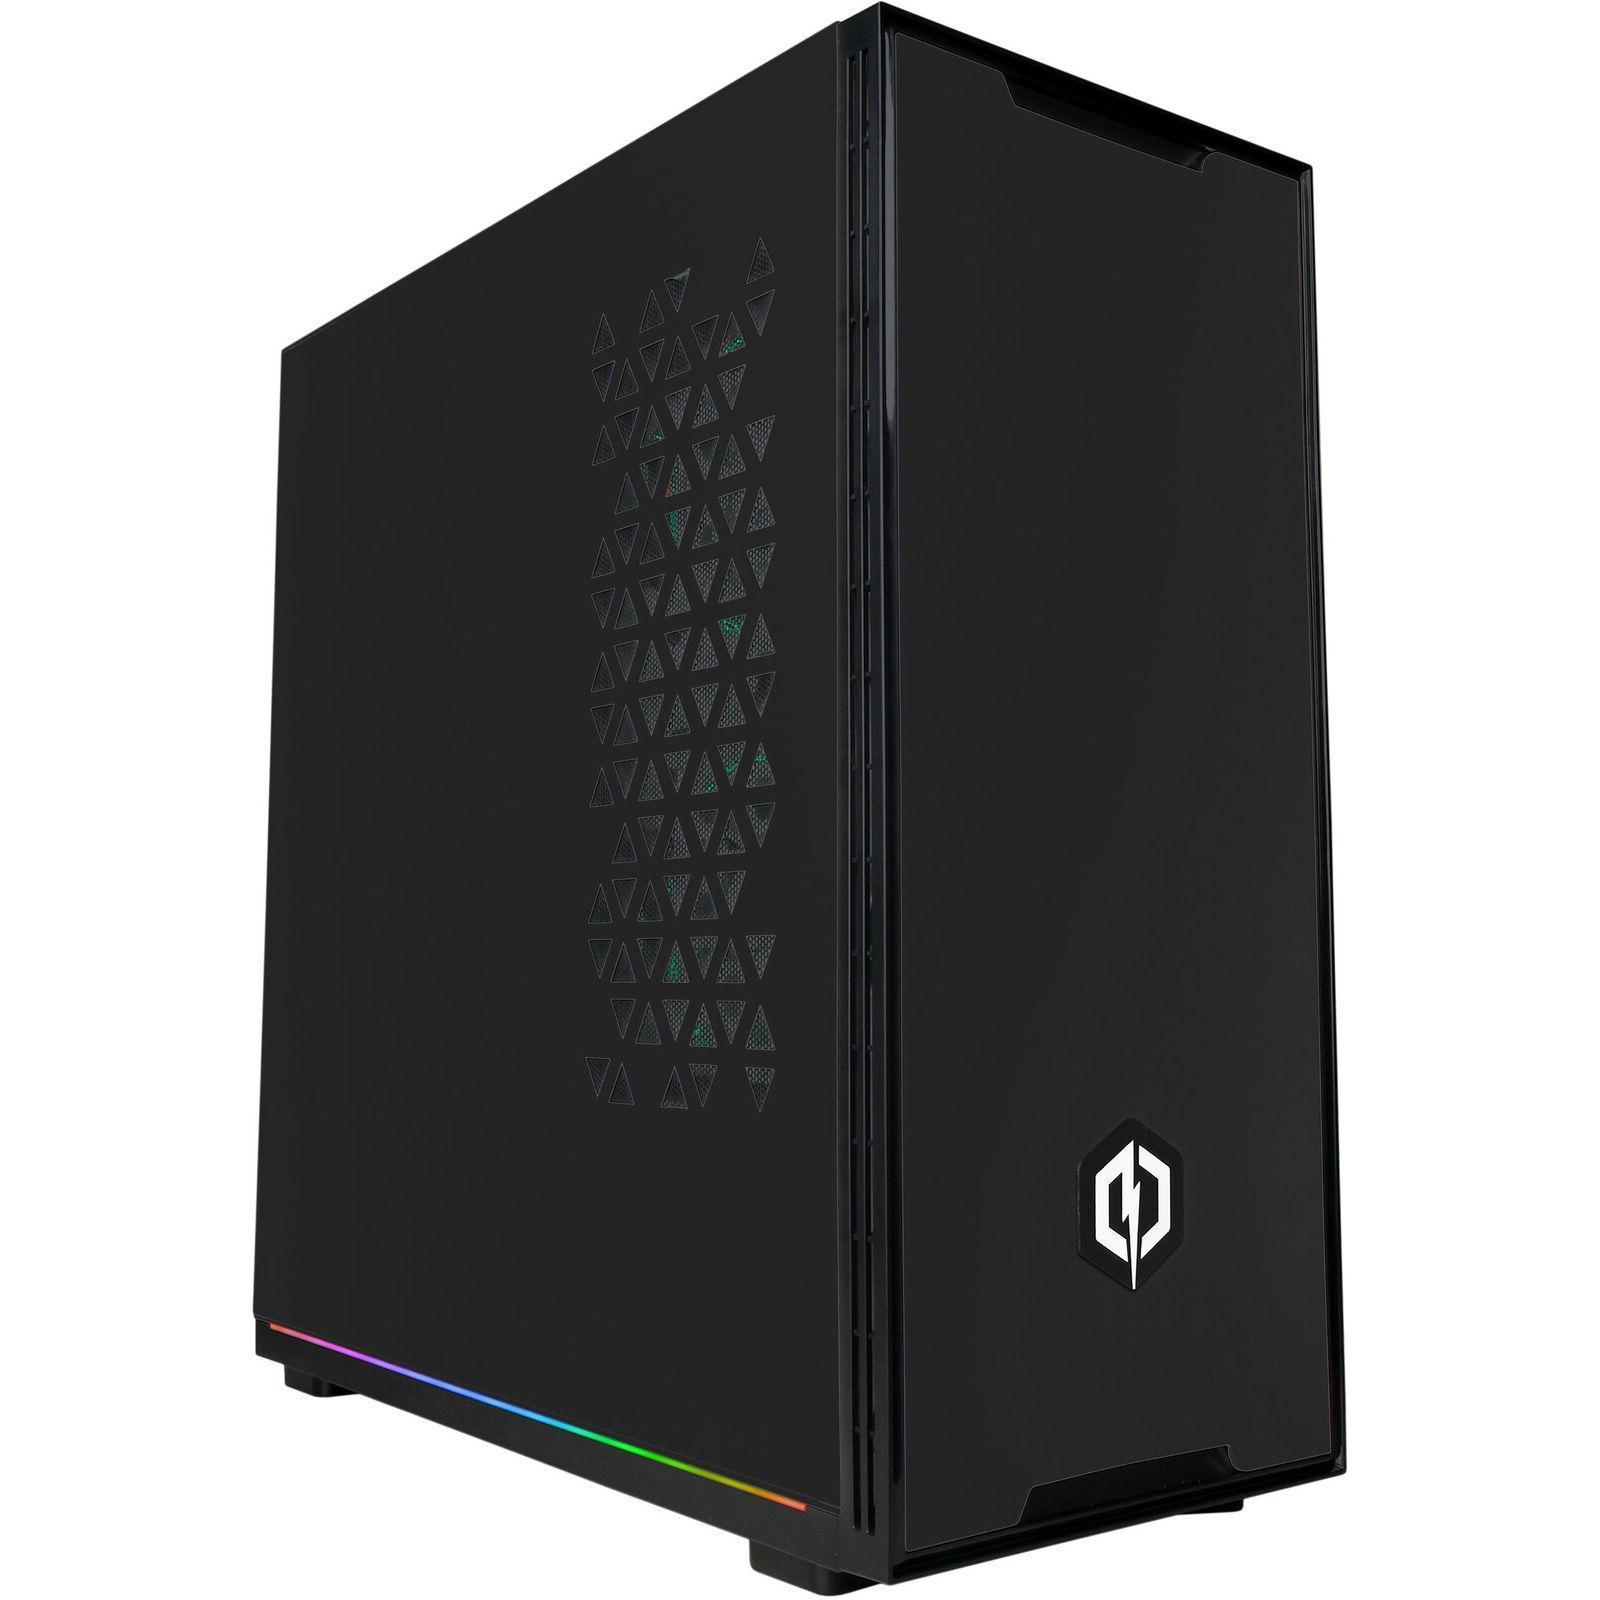 CyberPowerPC i7-9700K SSD 2TB HDD SUPER